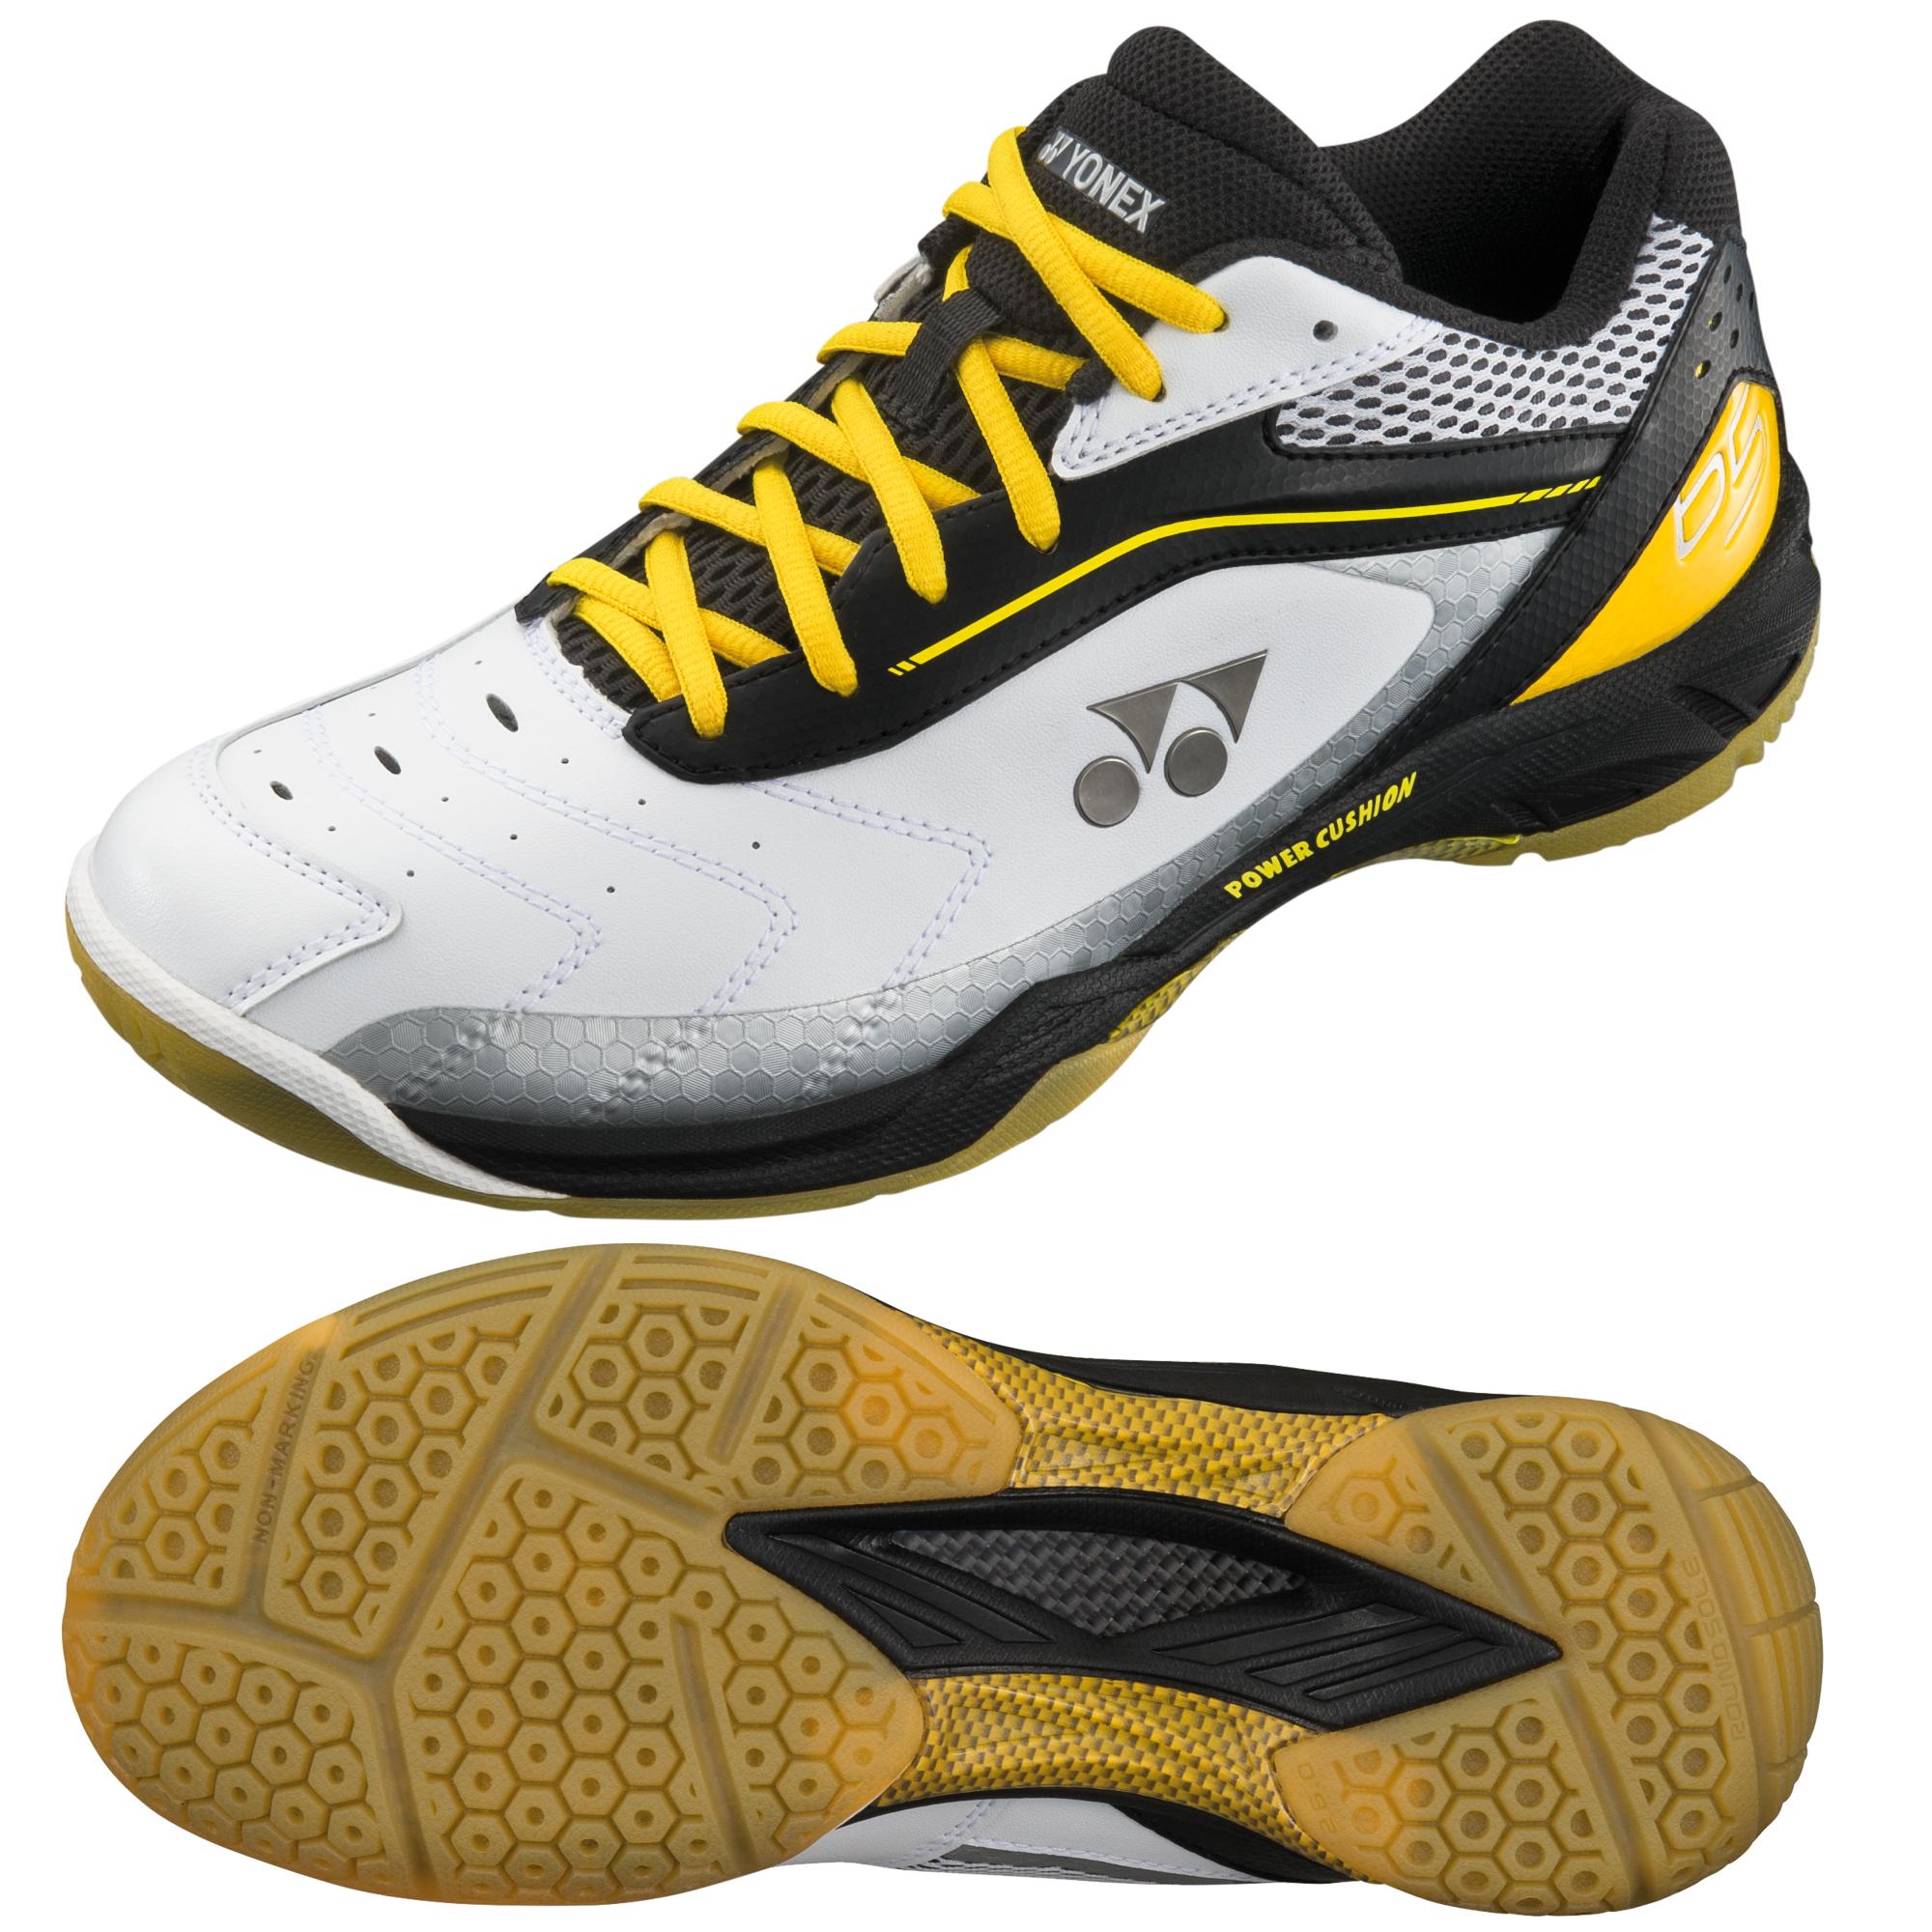 Yonex Power Cushion 65 Mens Badminton Shoes  10 UK